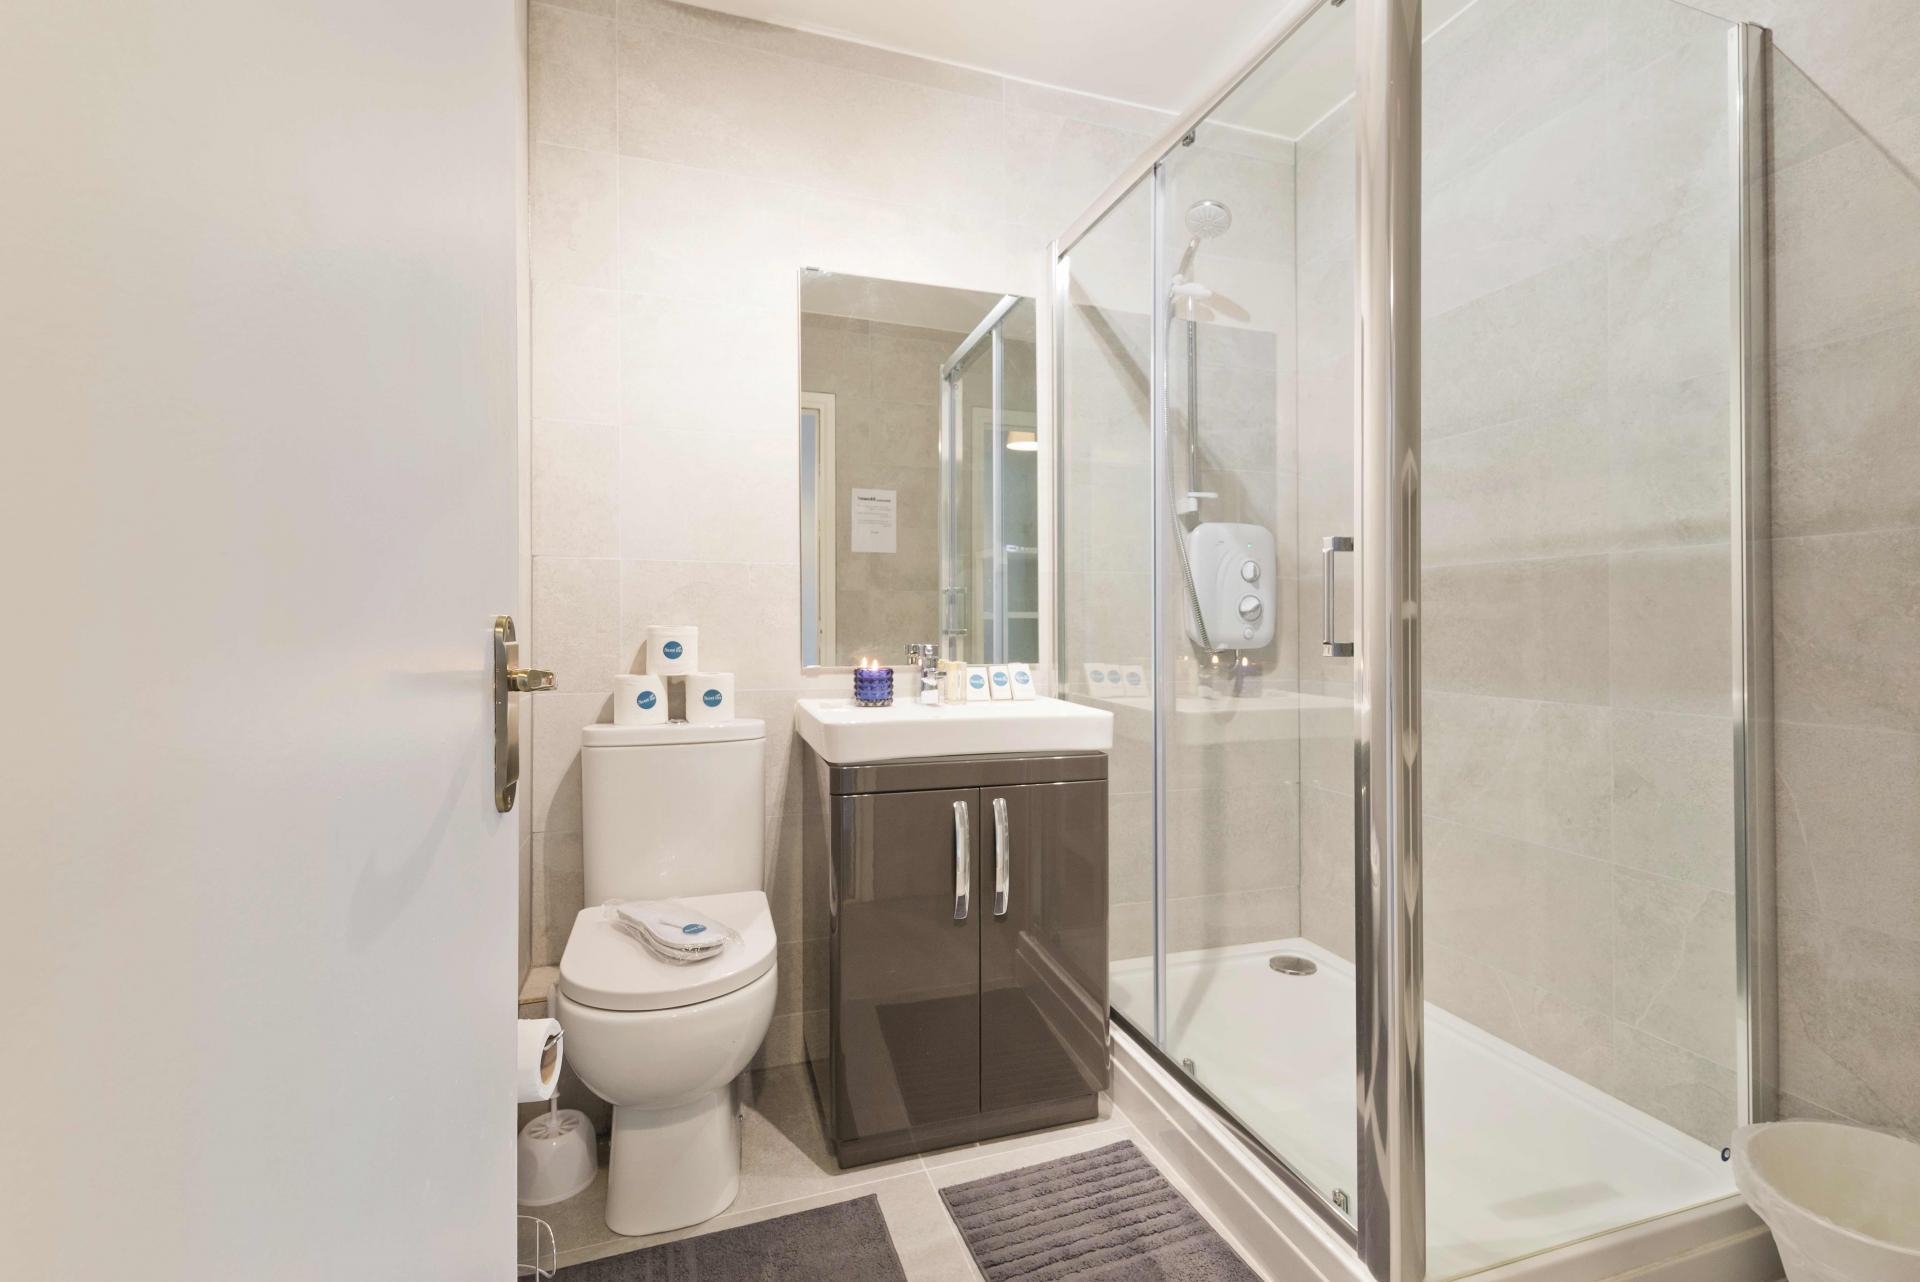 Bathroom at Crow Street Apartment, Temple Bar, Dublin - Citybase Apartments